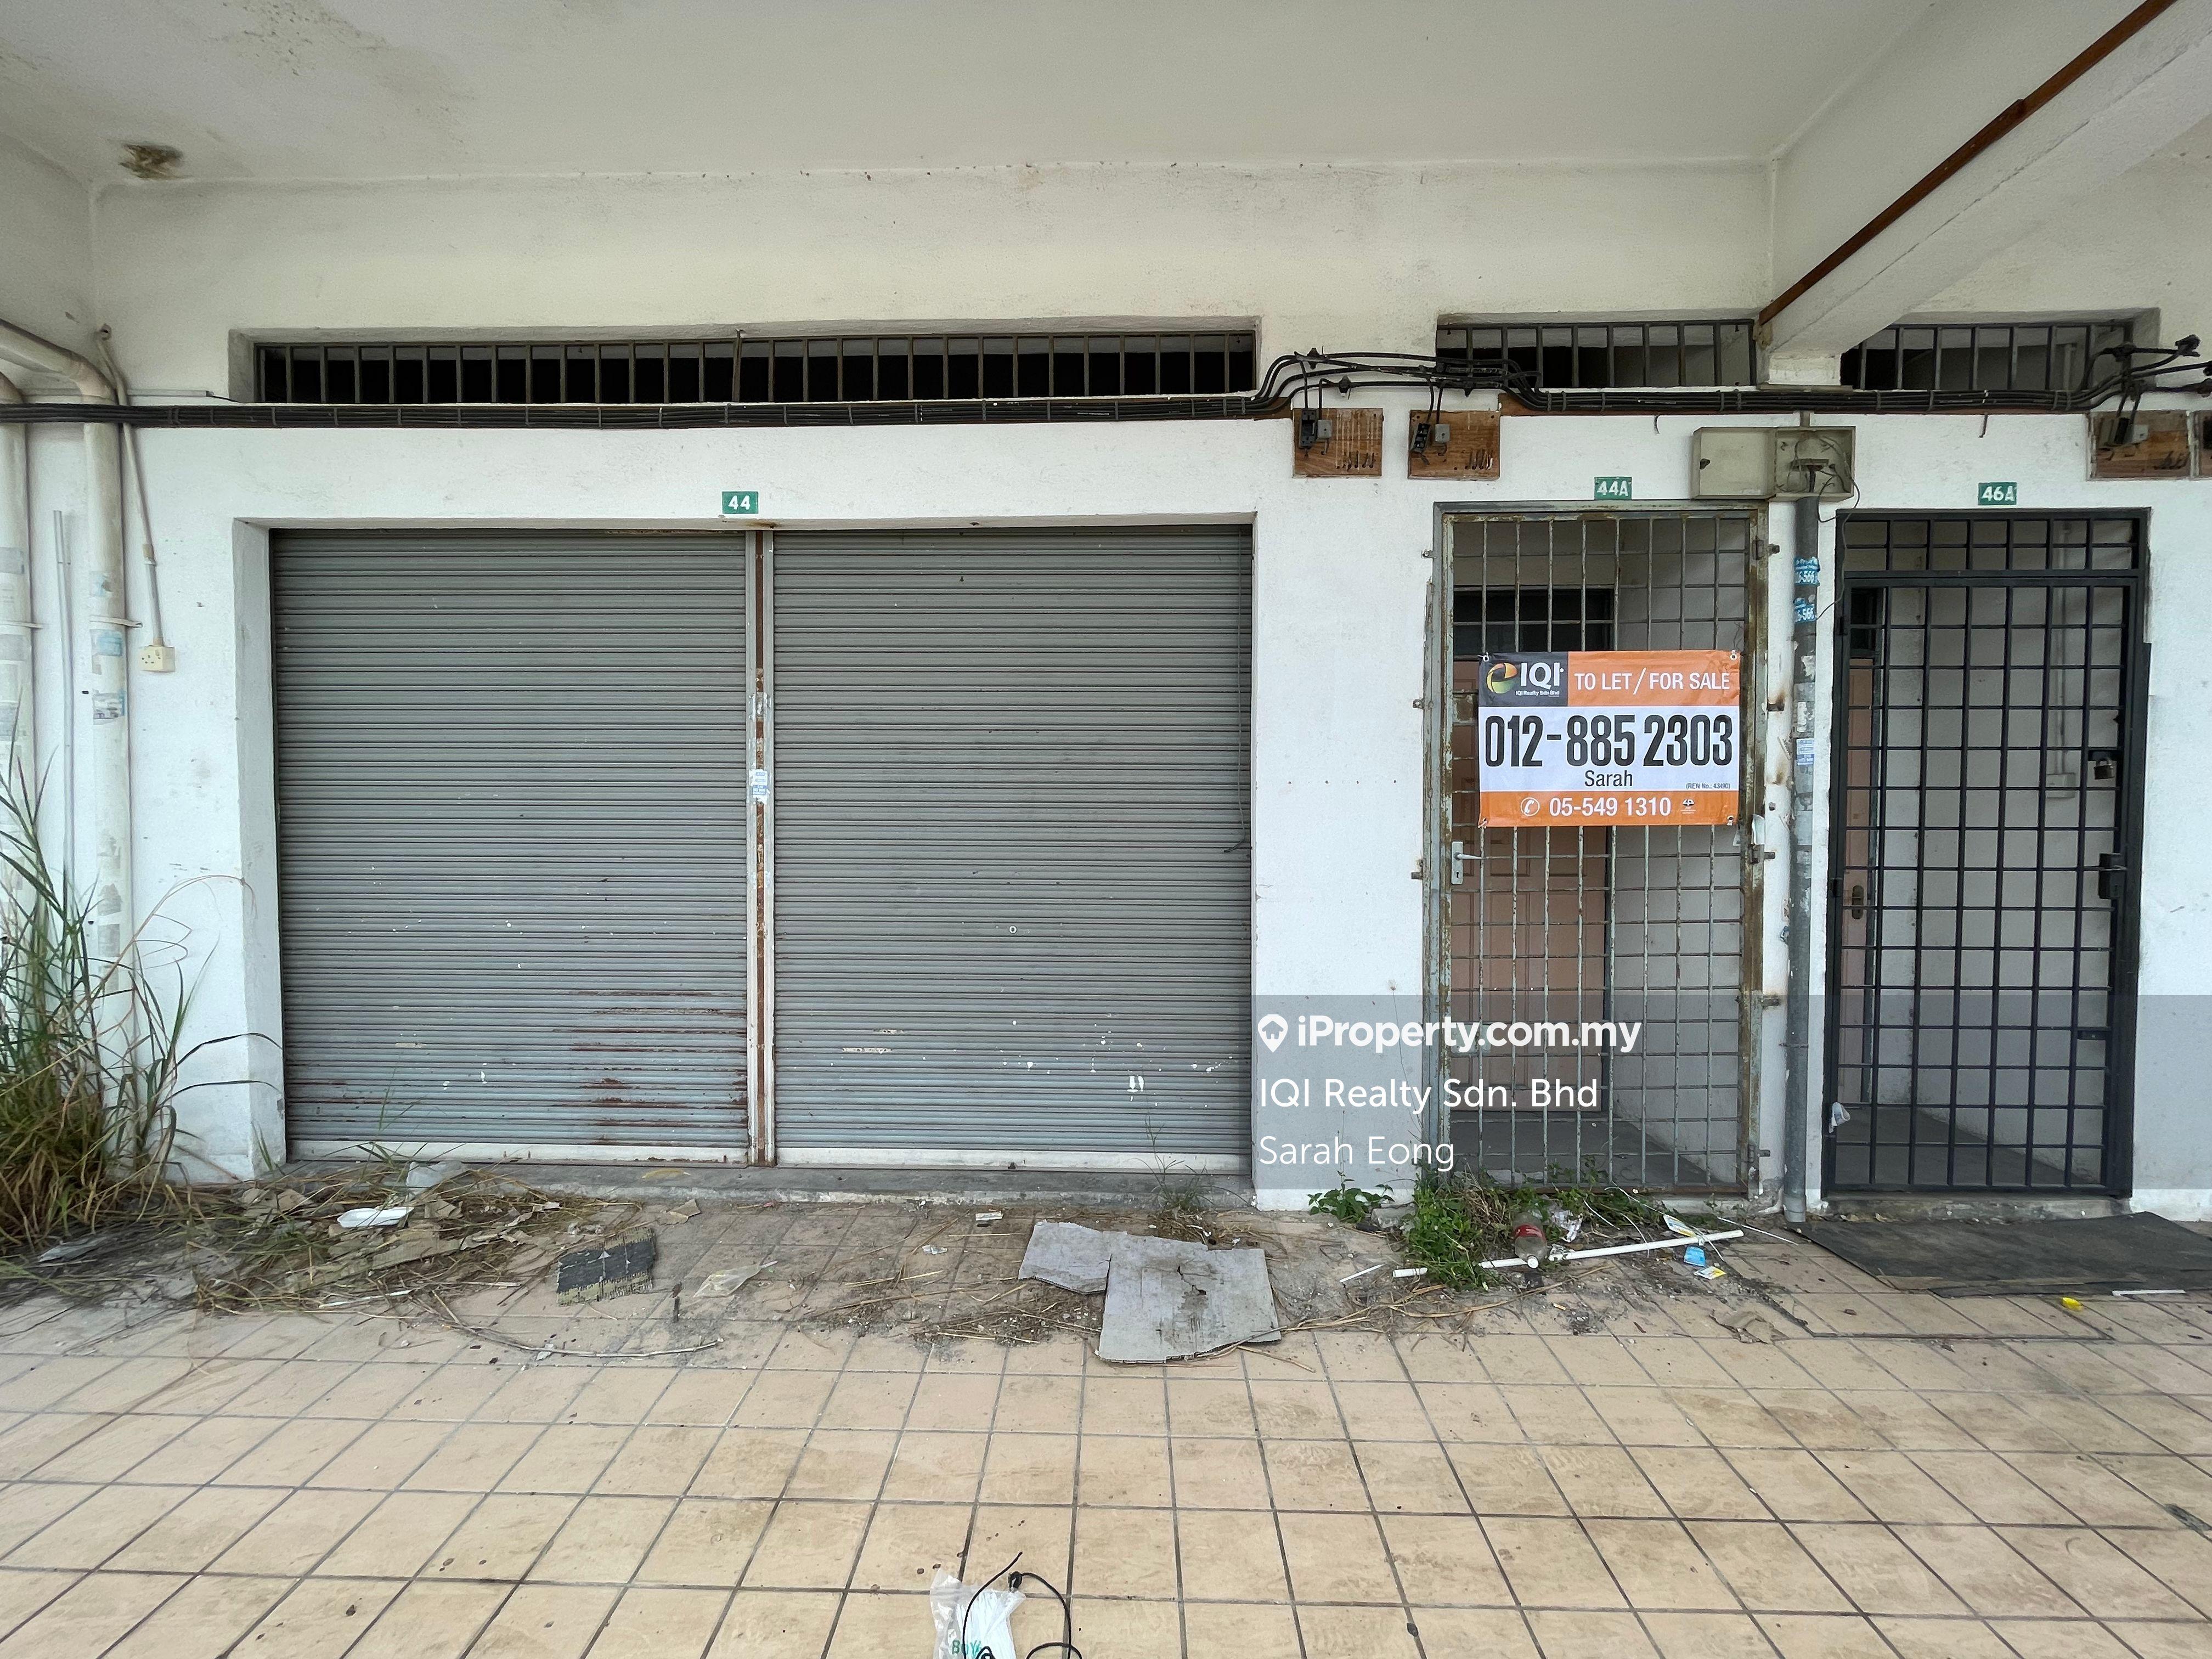 Bandar Pengkalan Indah, Ipoh